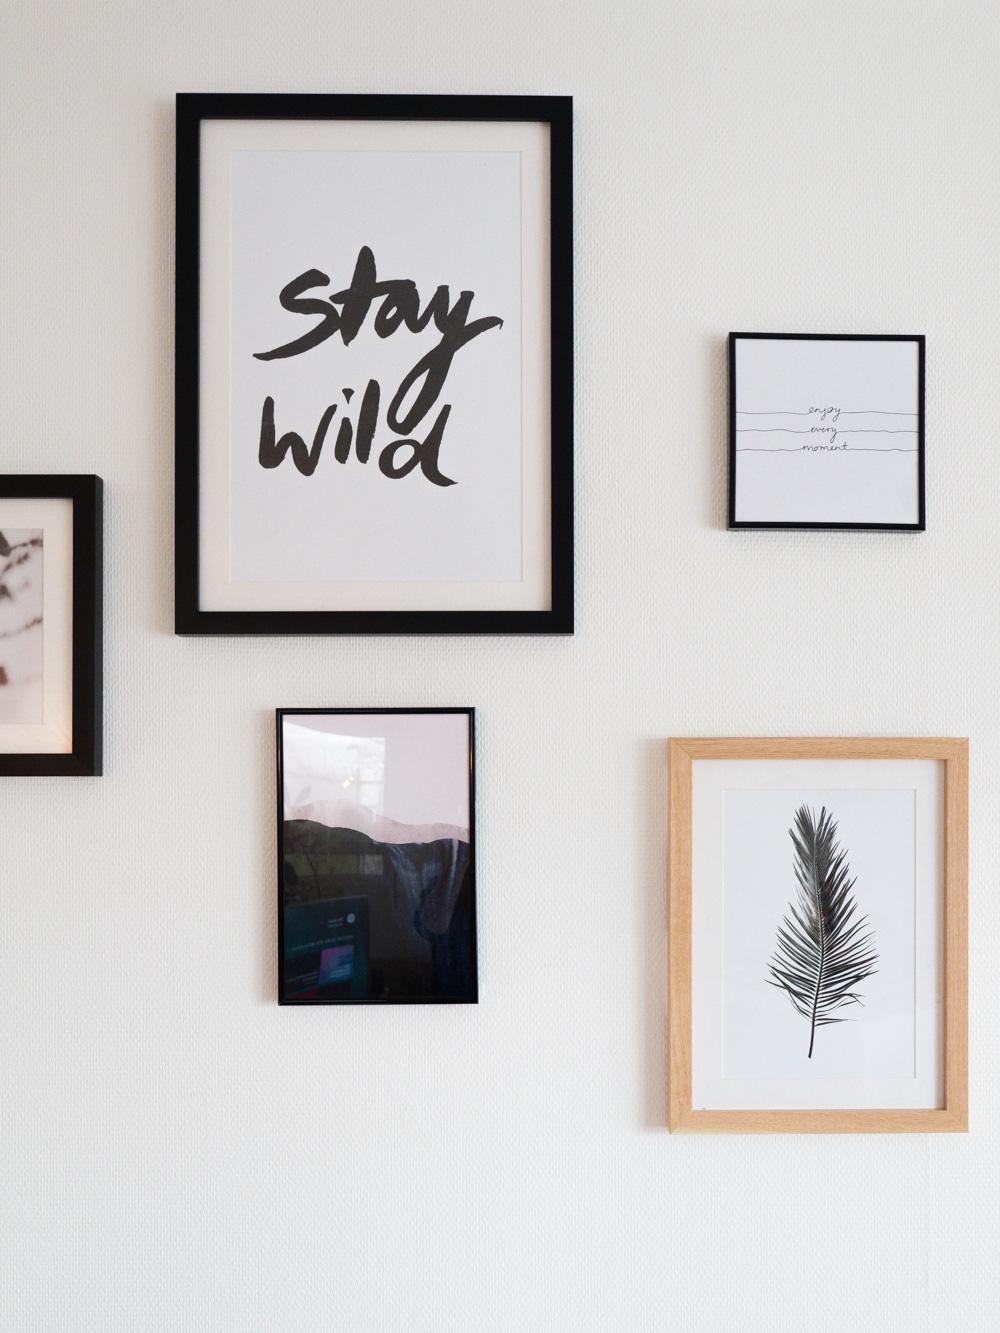 Accrocher Tableau Mur Beton Sans Percer diy un mur de cadres sans percer - lili in wonderland